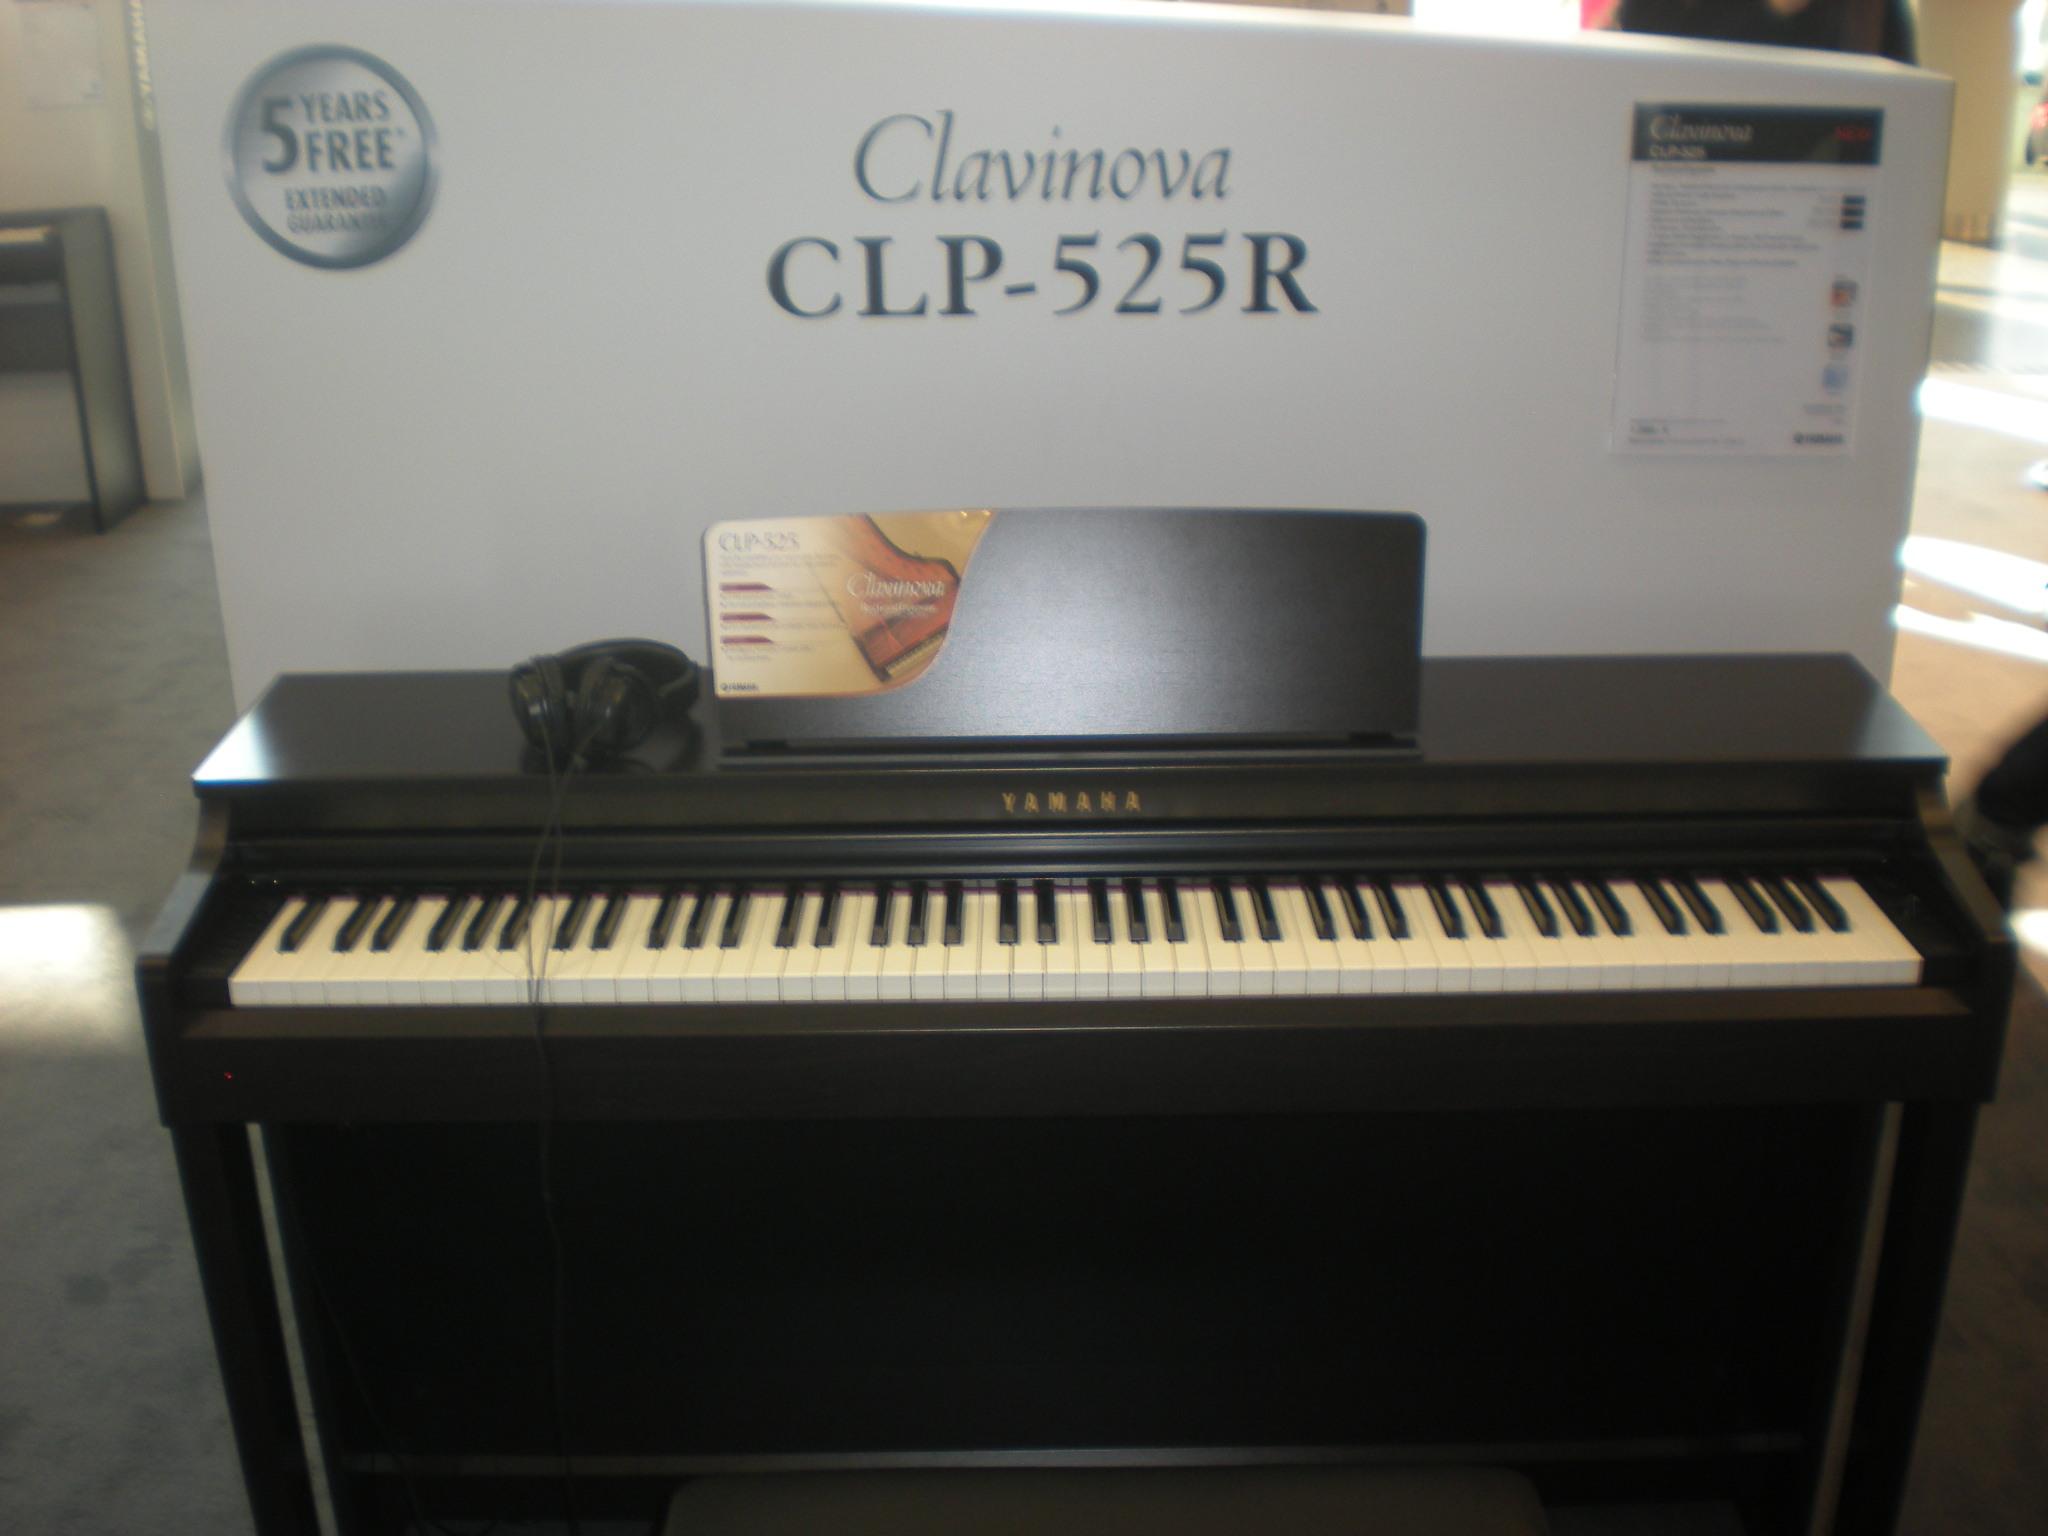 Yamaha_Clavinova_CLP-525_face.JPG